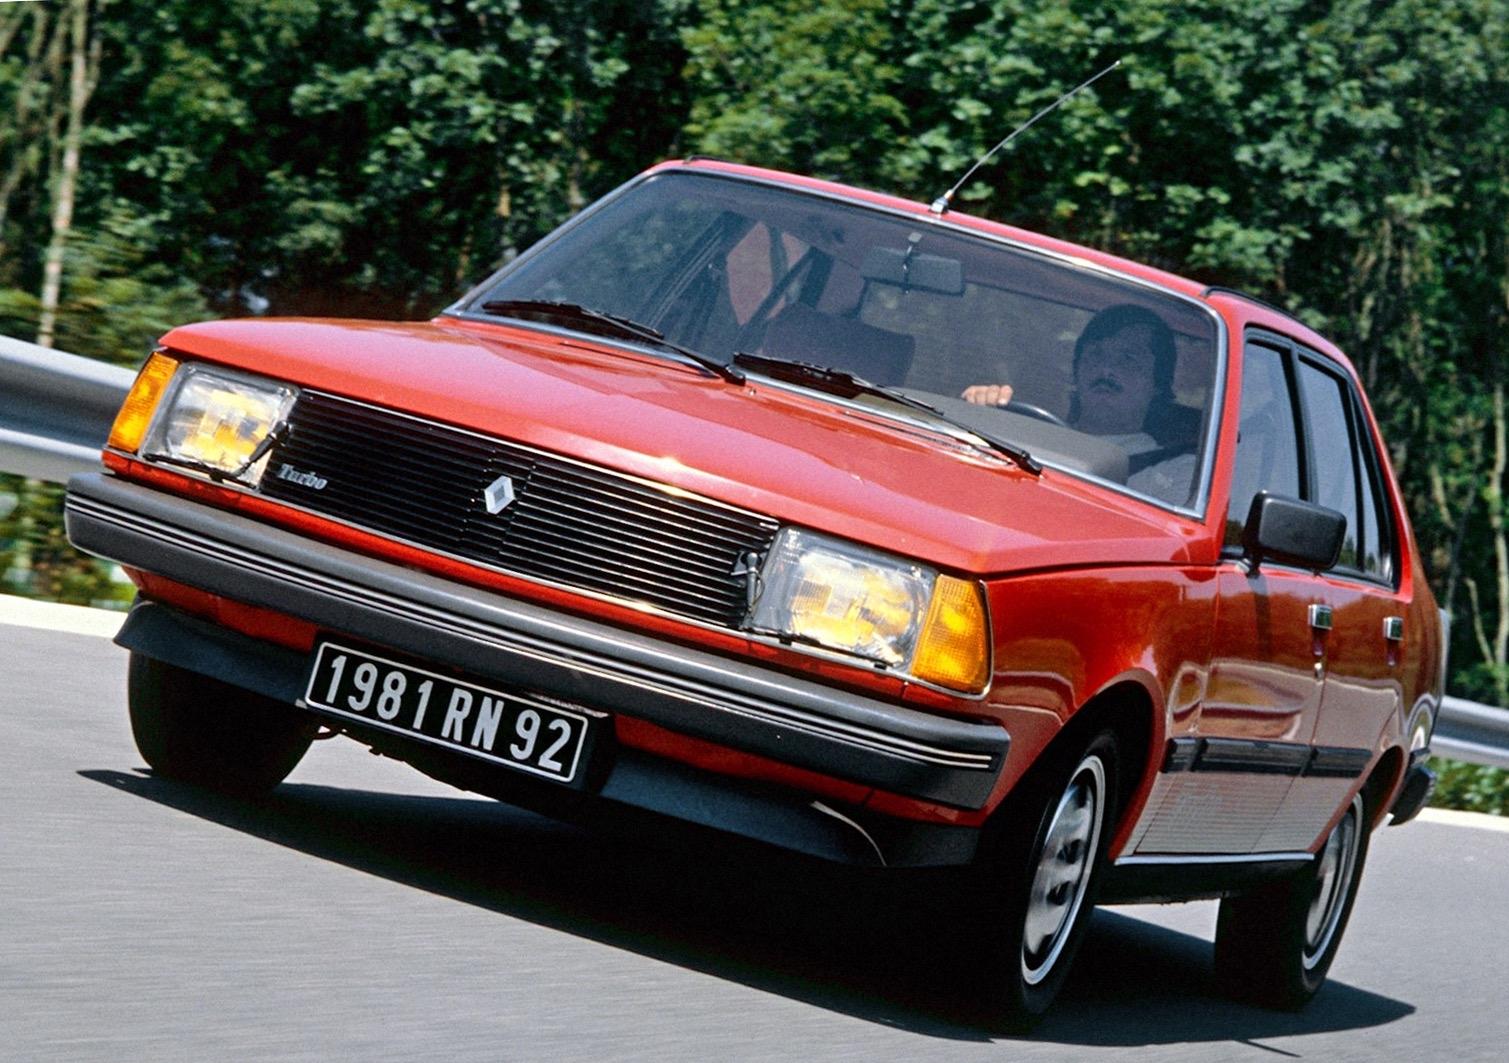 Renault 18 Turbo 1980 1985 La Premiere Berline Suralimentee De Renault Des 3 500